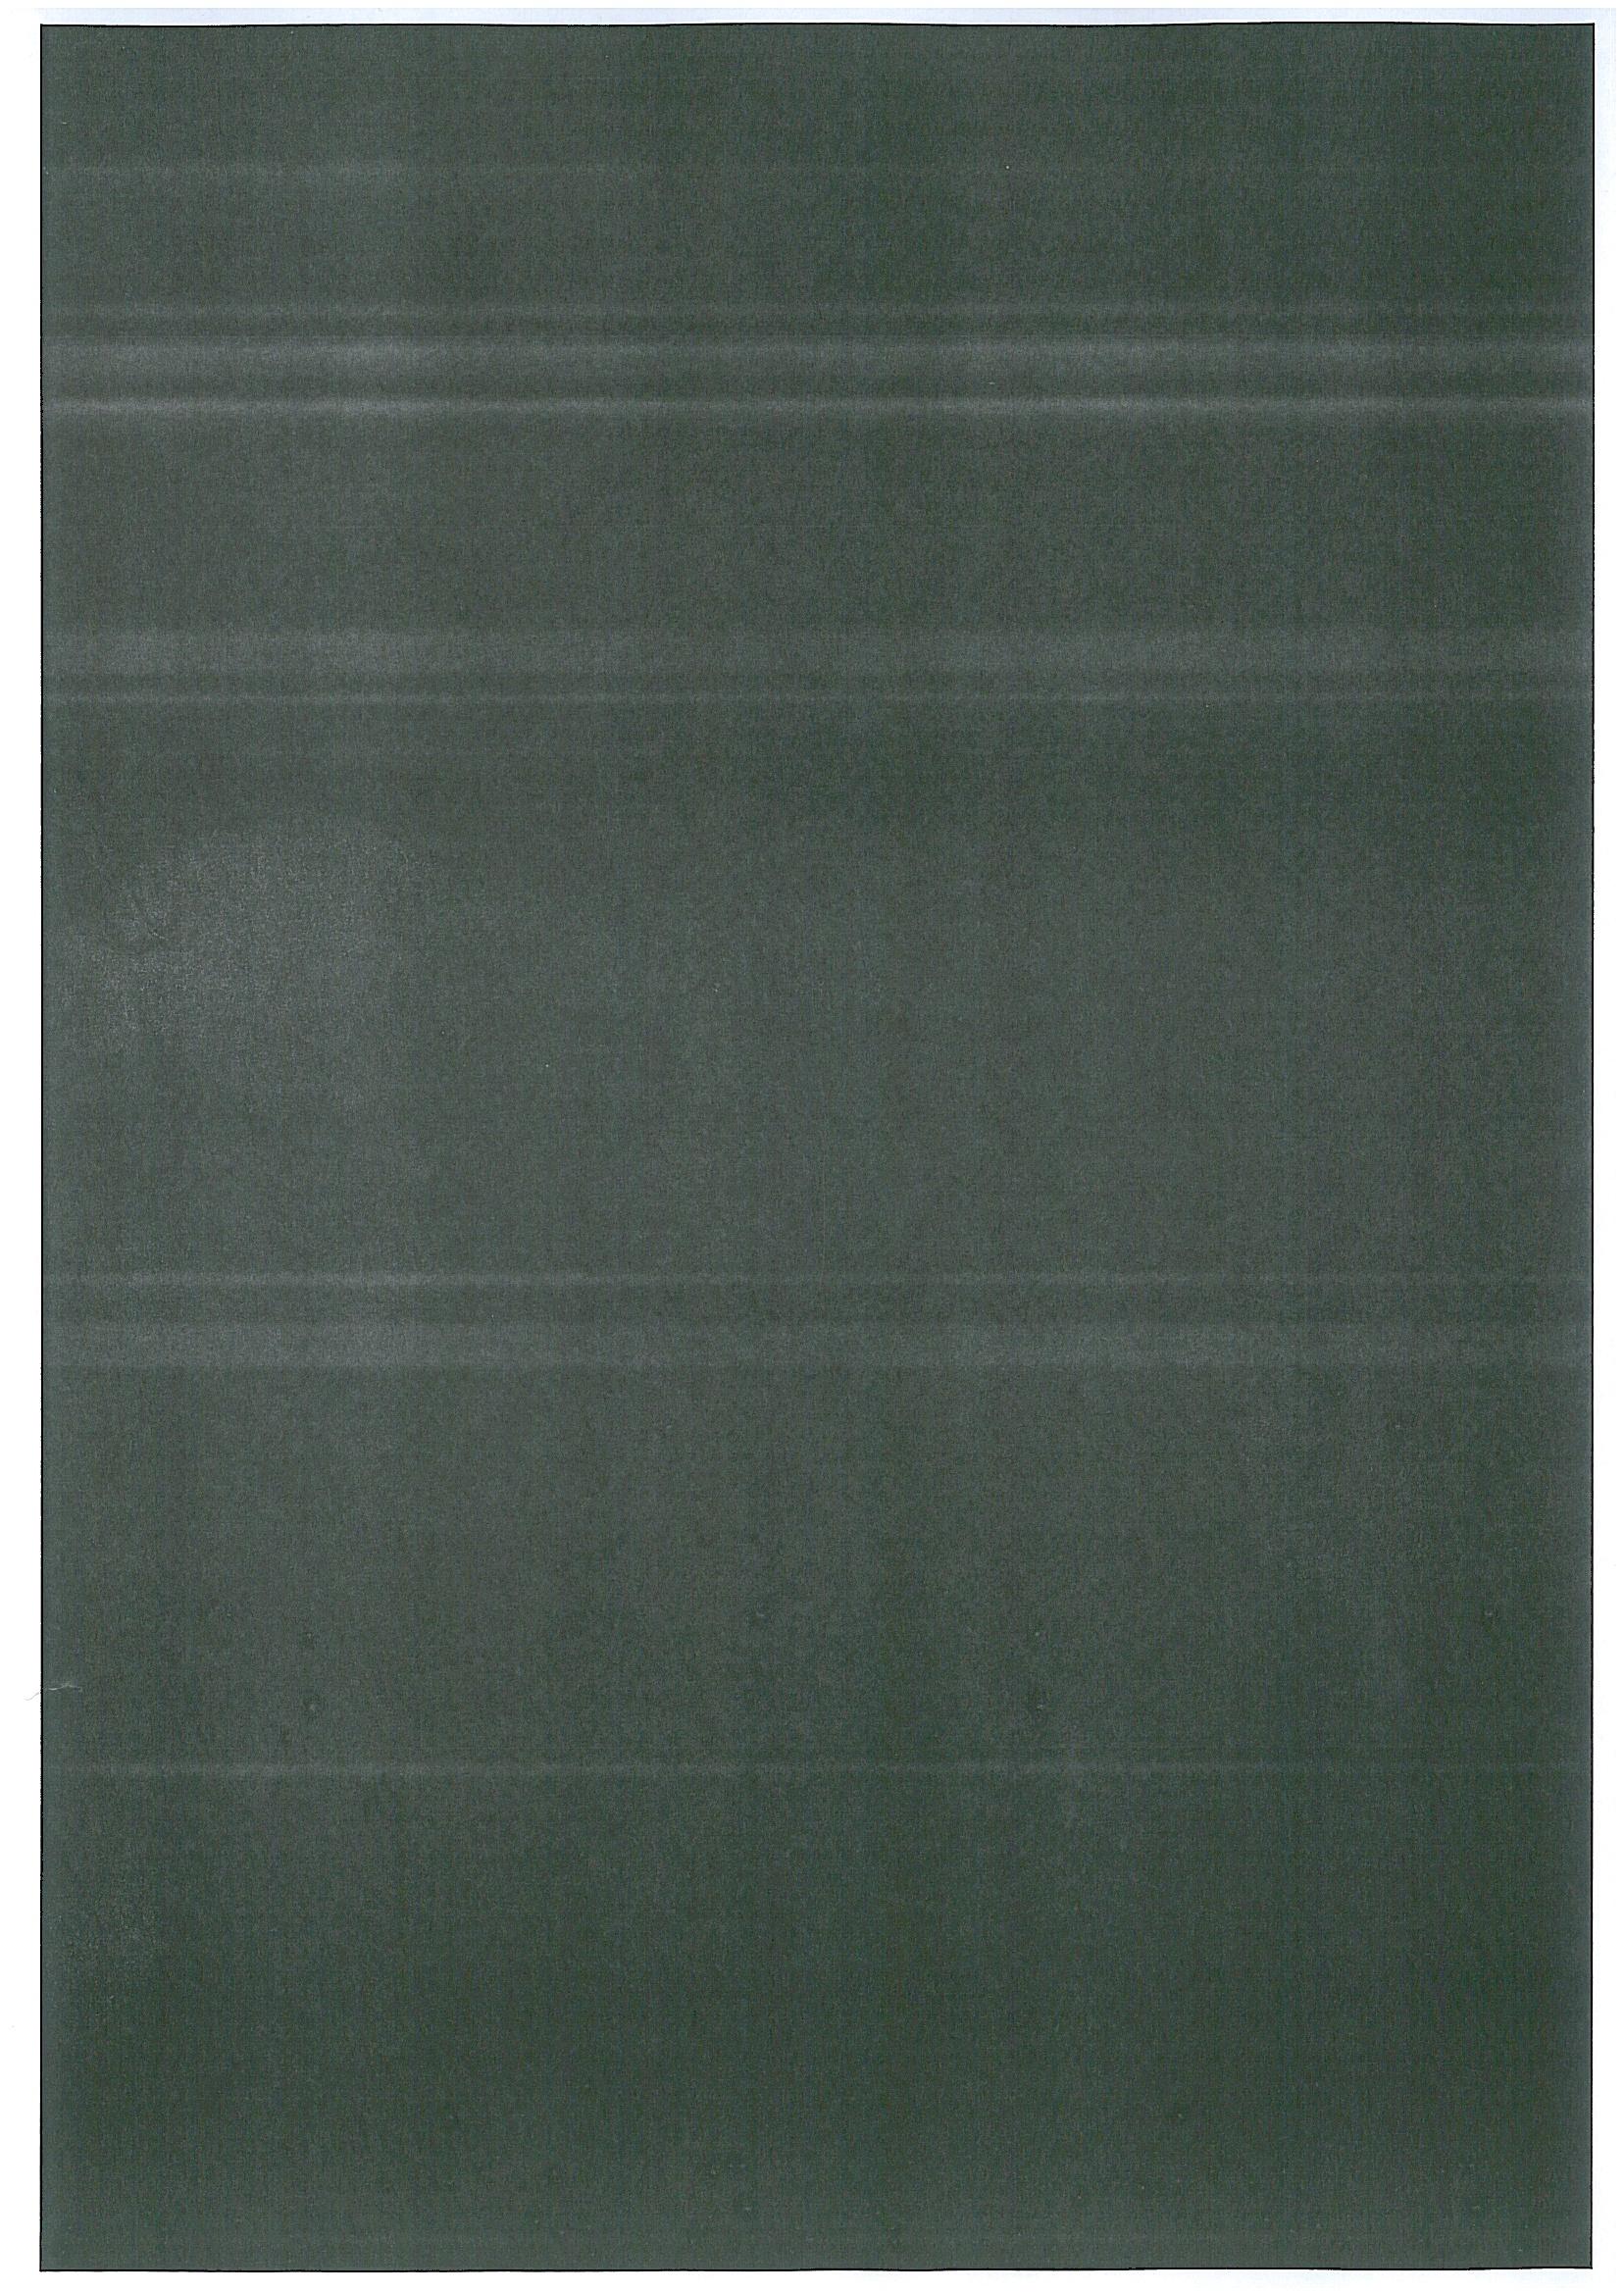 bizhub C350 - Pasek na wydruku (zdjecie)